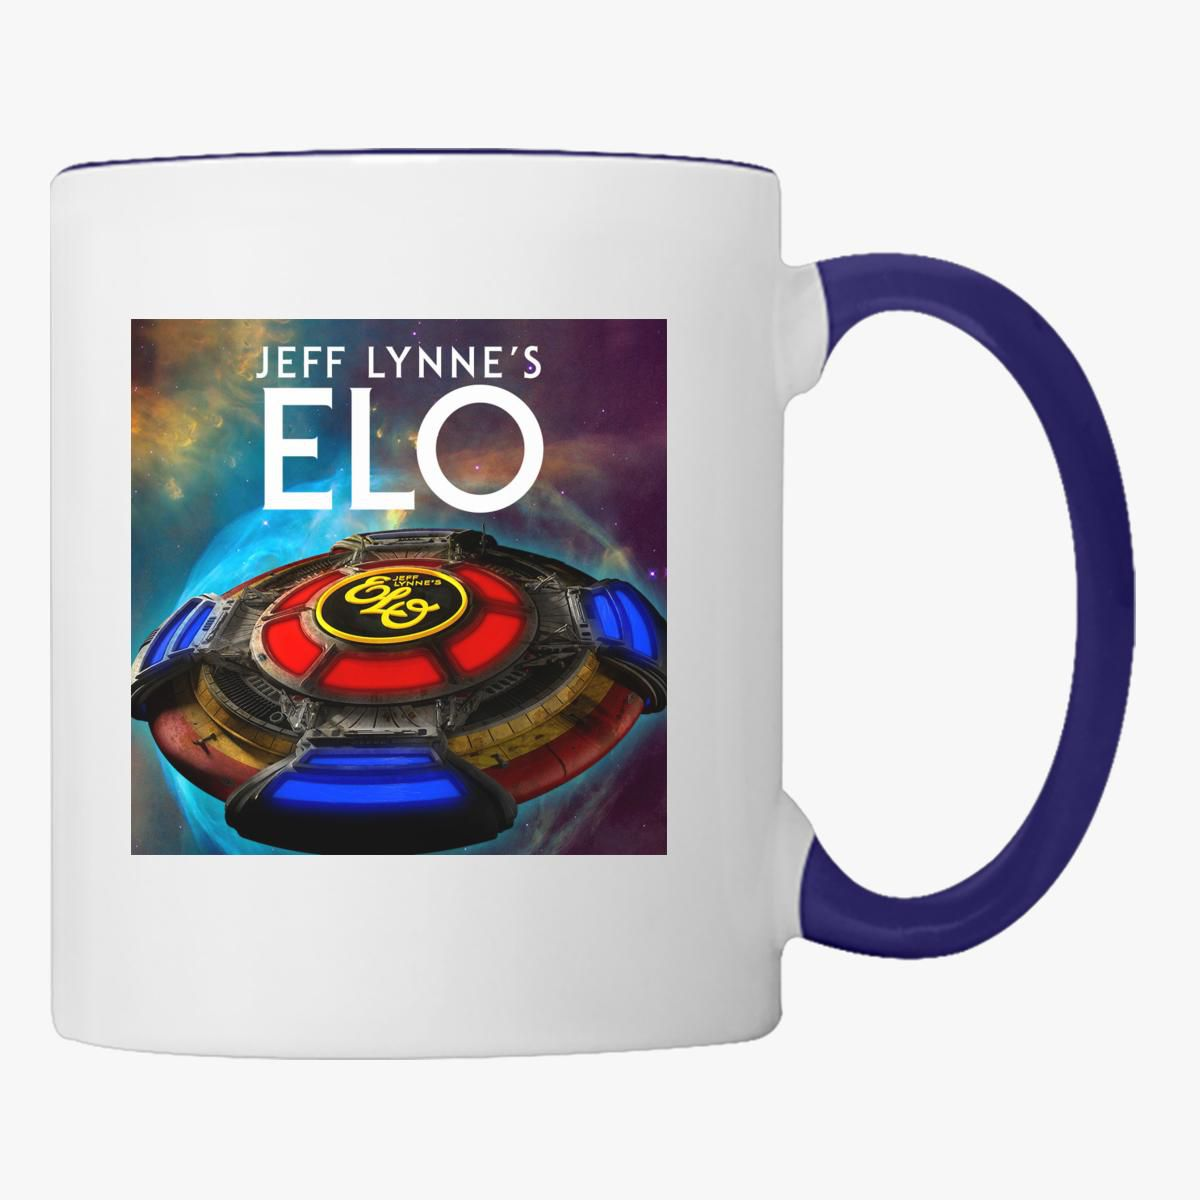 Jeff Lynne's ELO Tour 2018 Coffee Mug - Customon